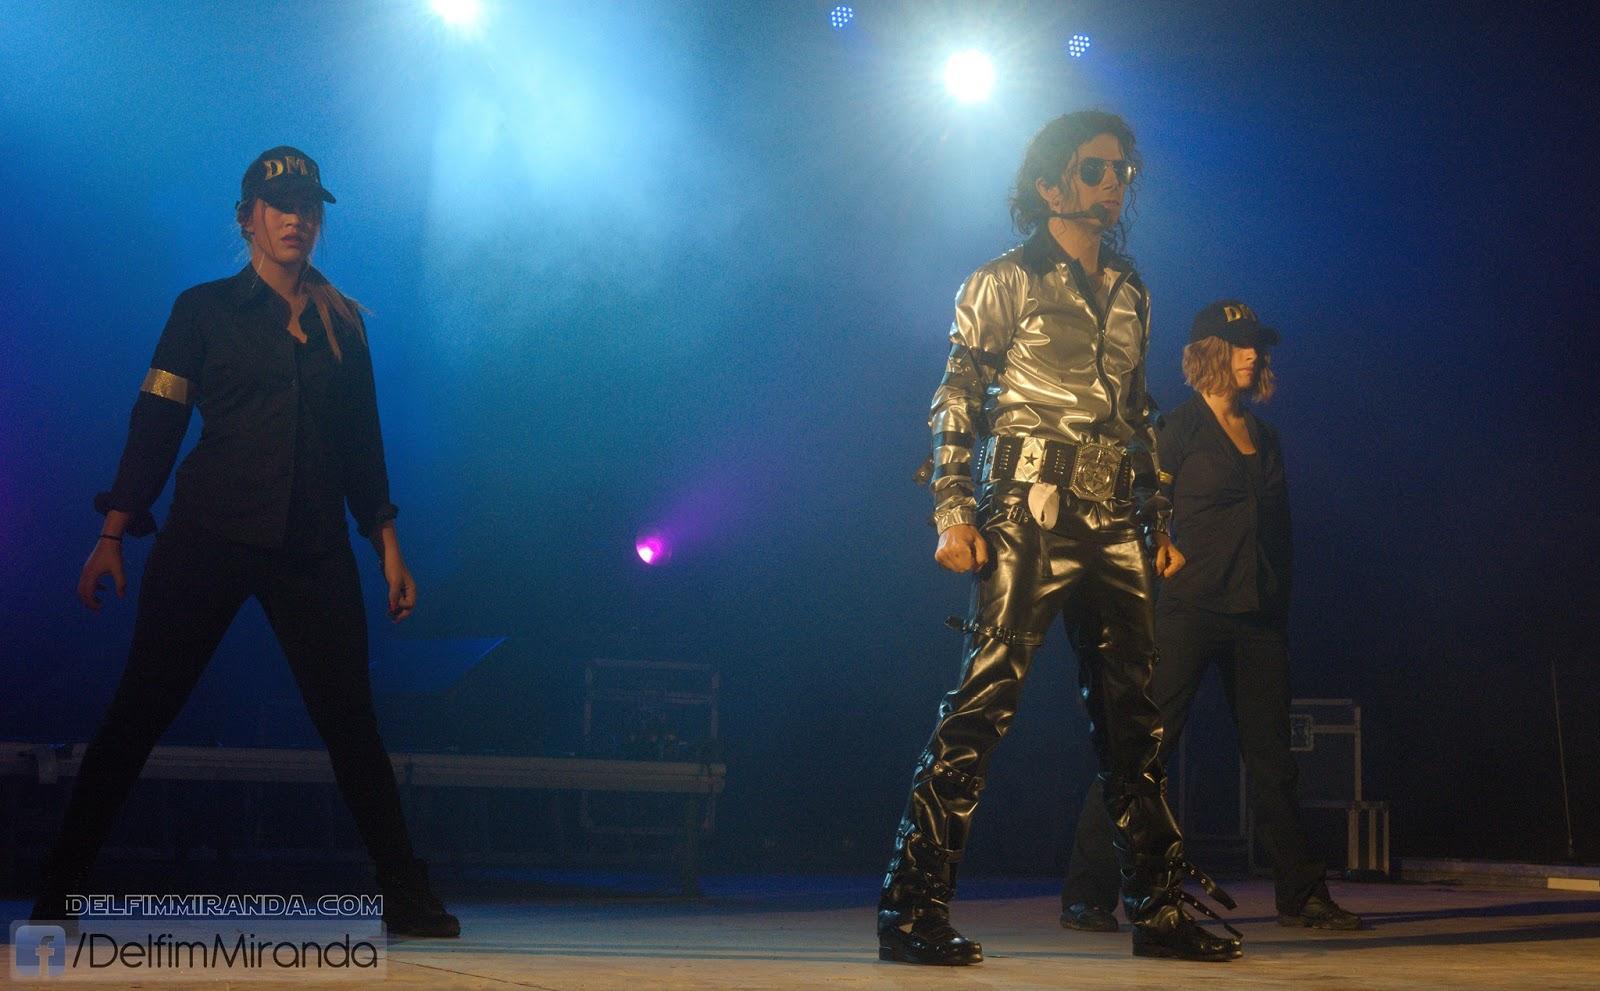 Delfim Miranda - Michael Jackson Tribute - Live performance - Sintra / Portugal